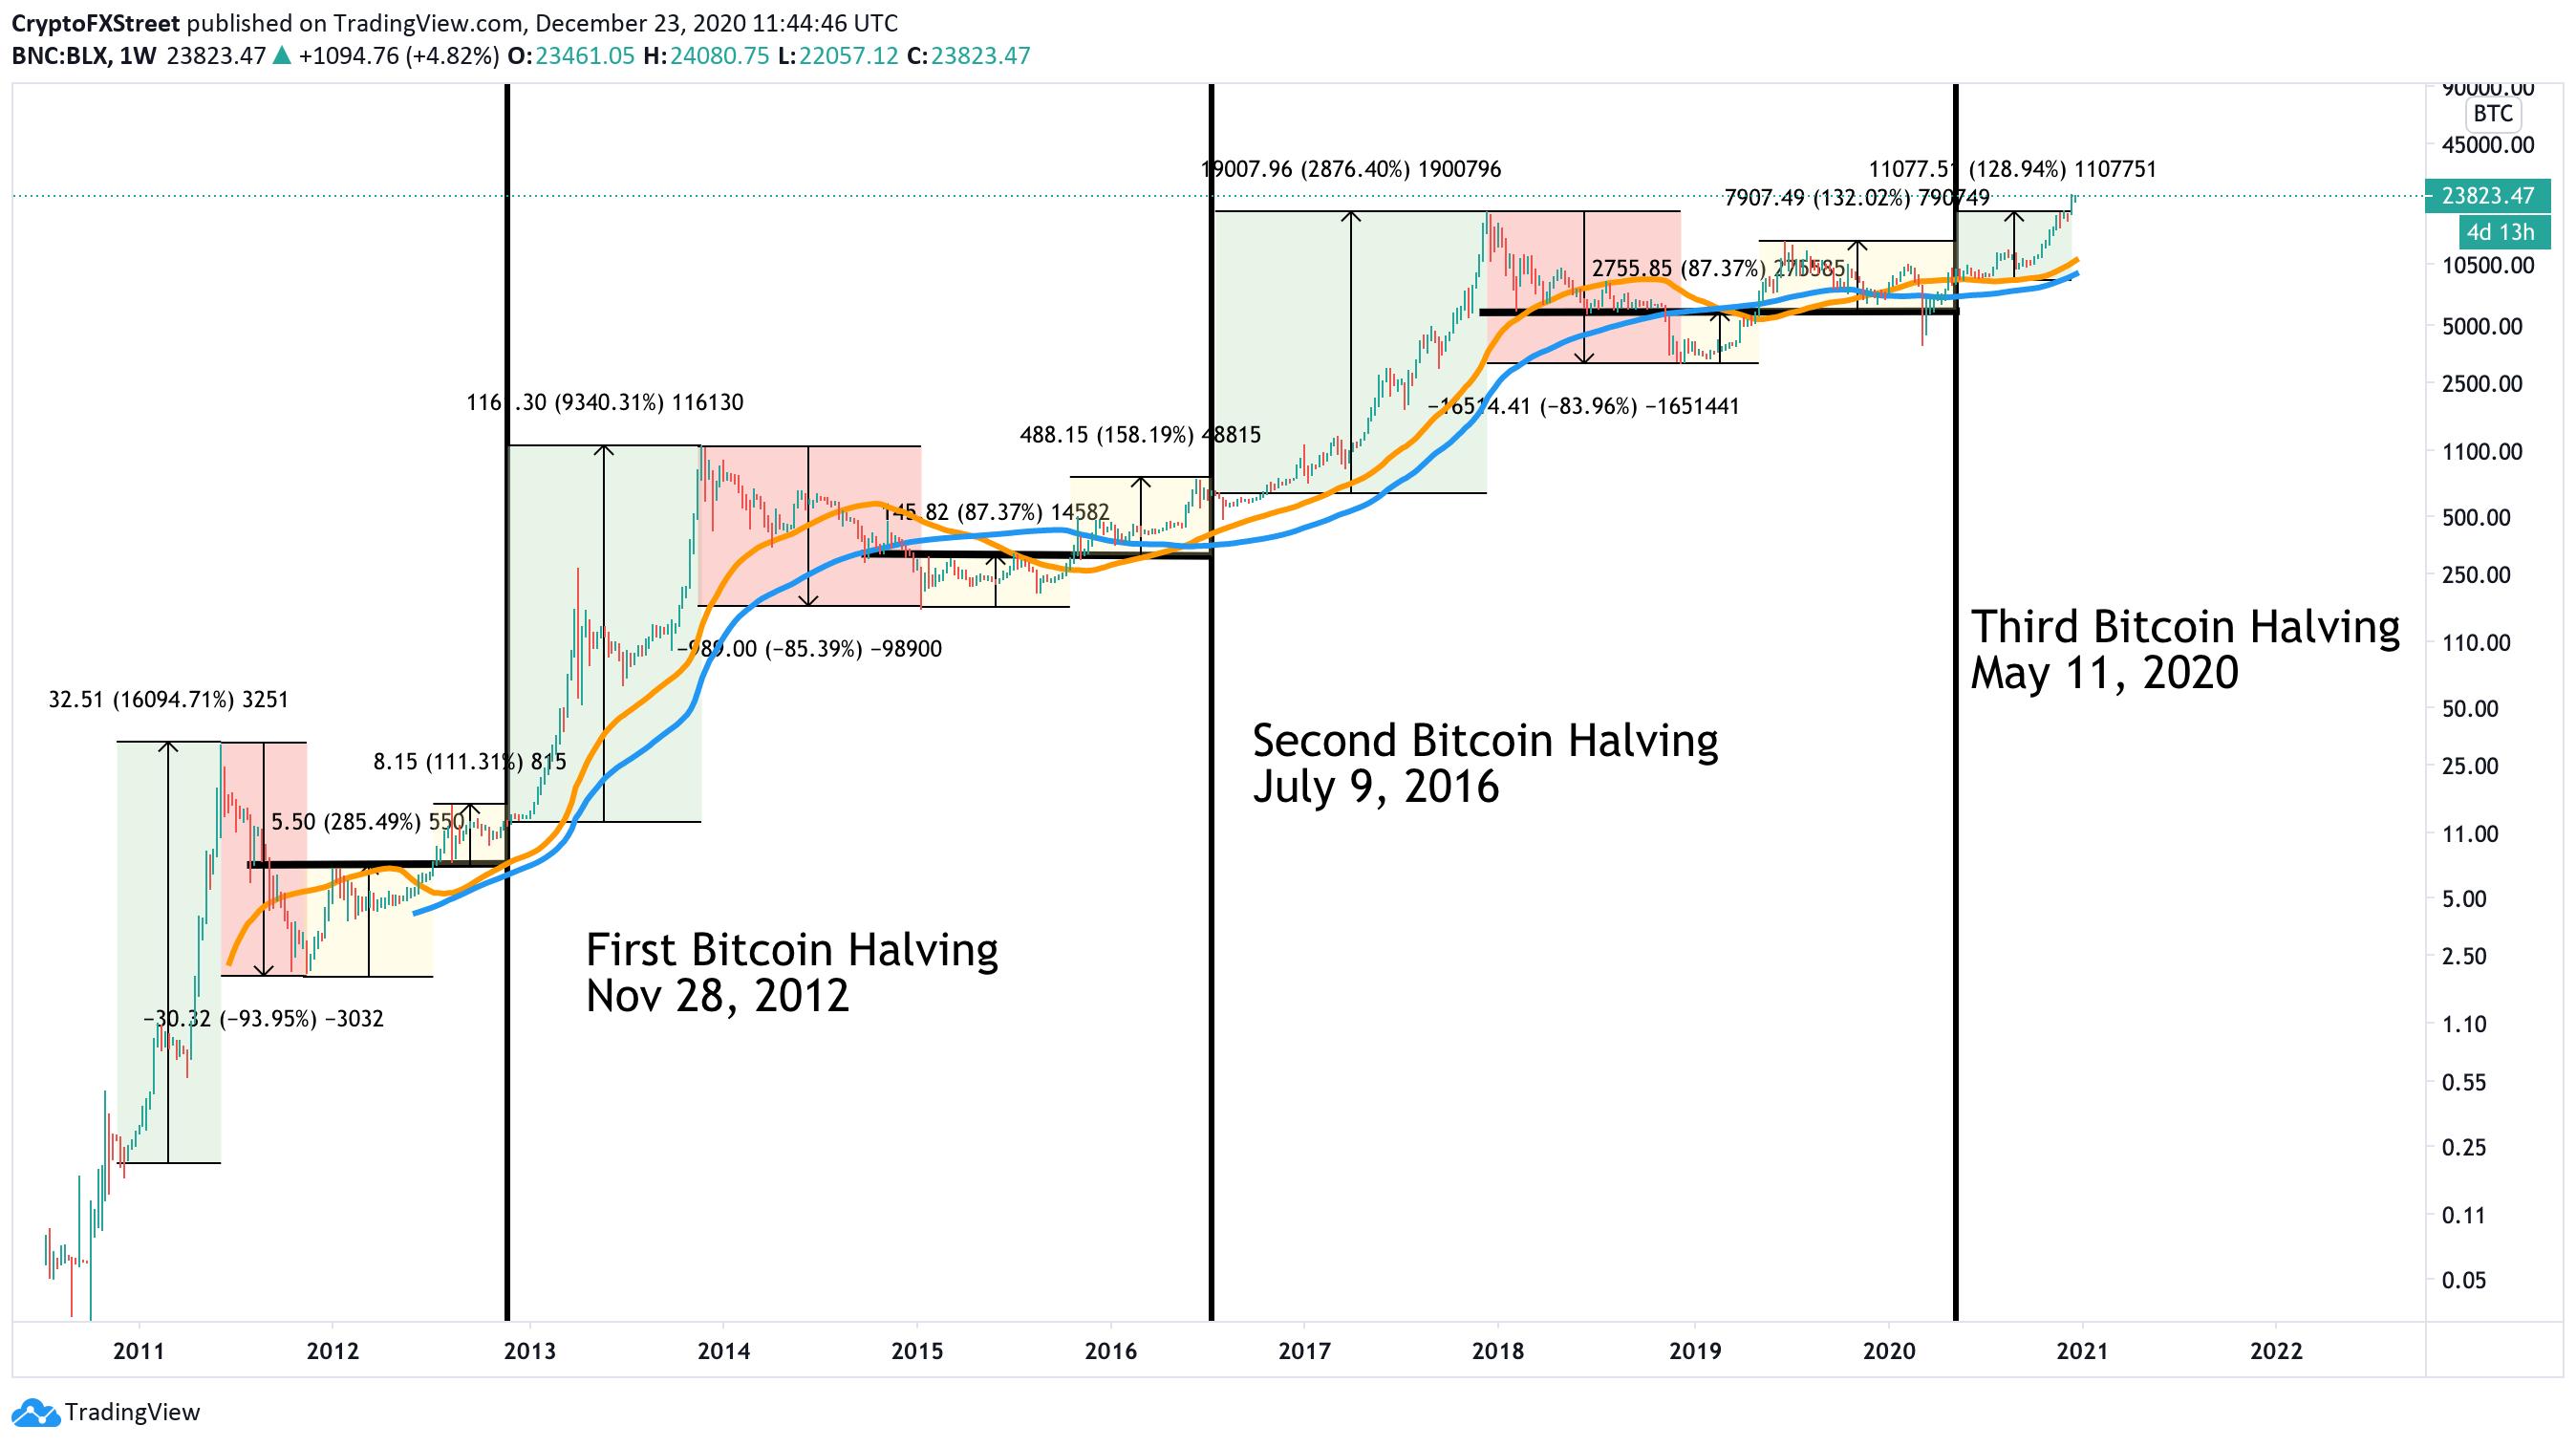 BTC price prediction chart 2021